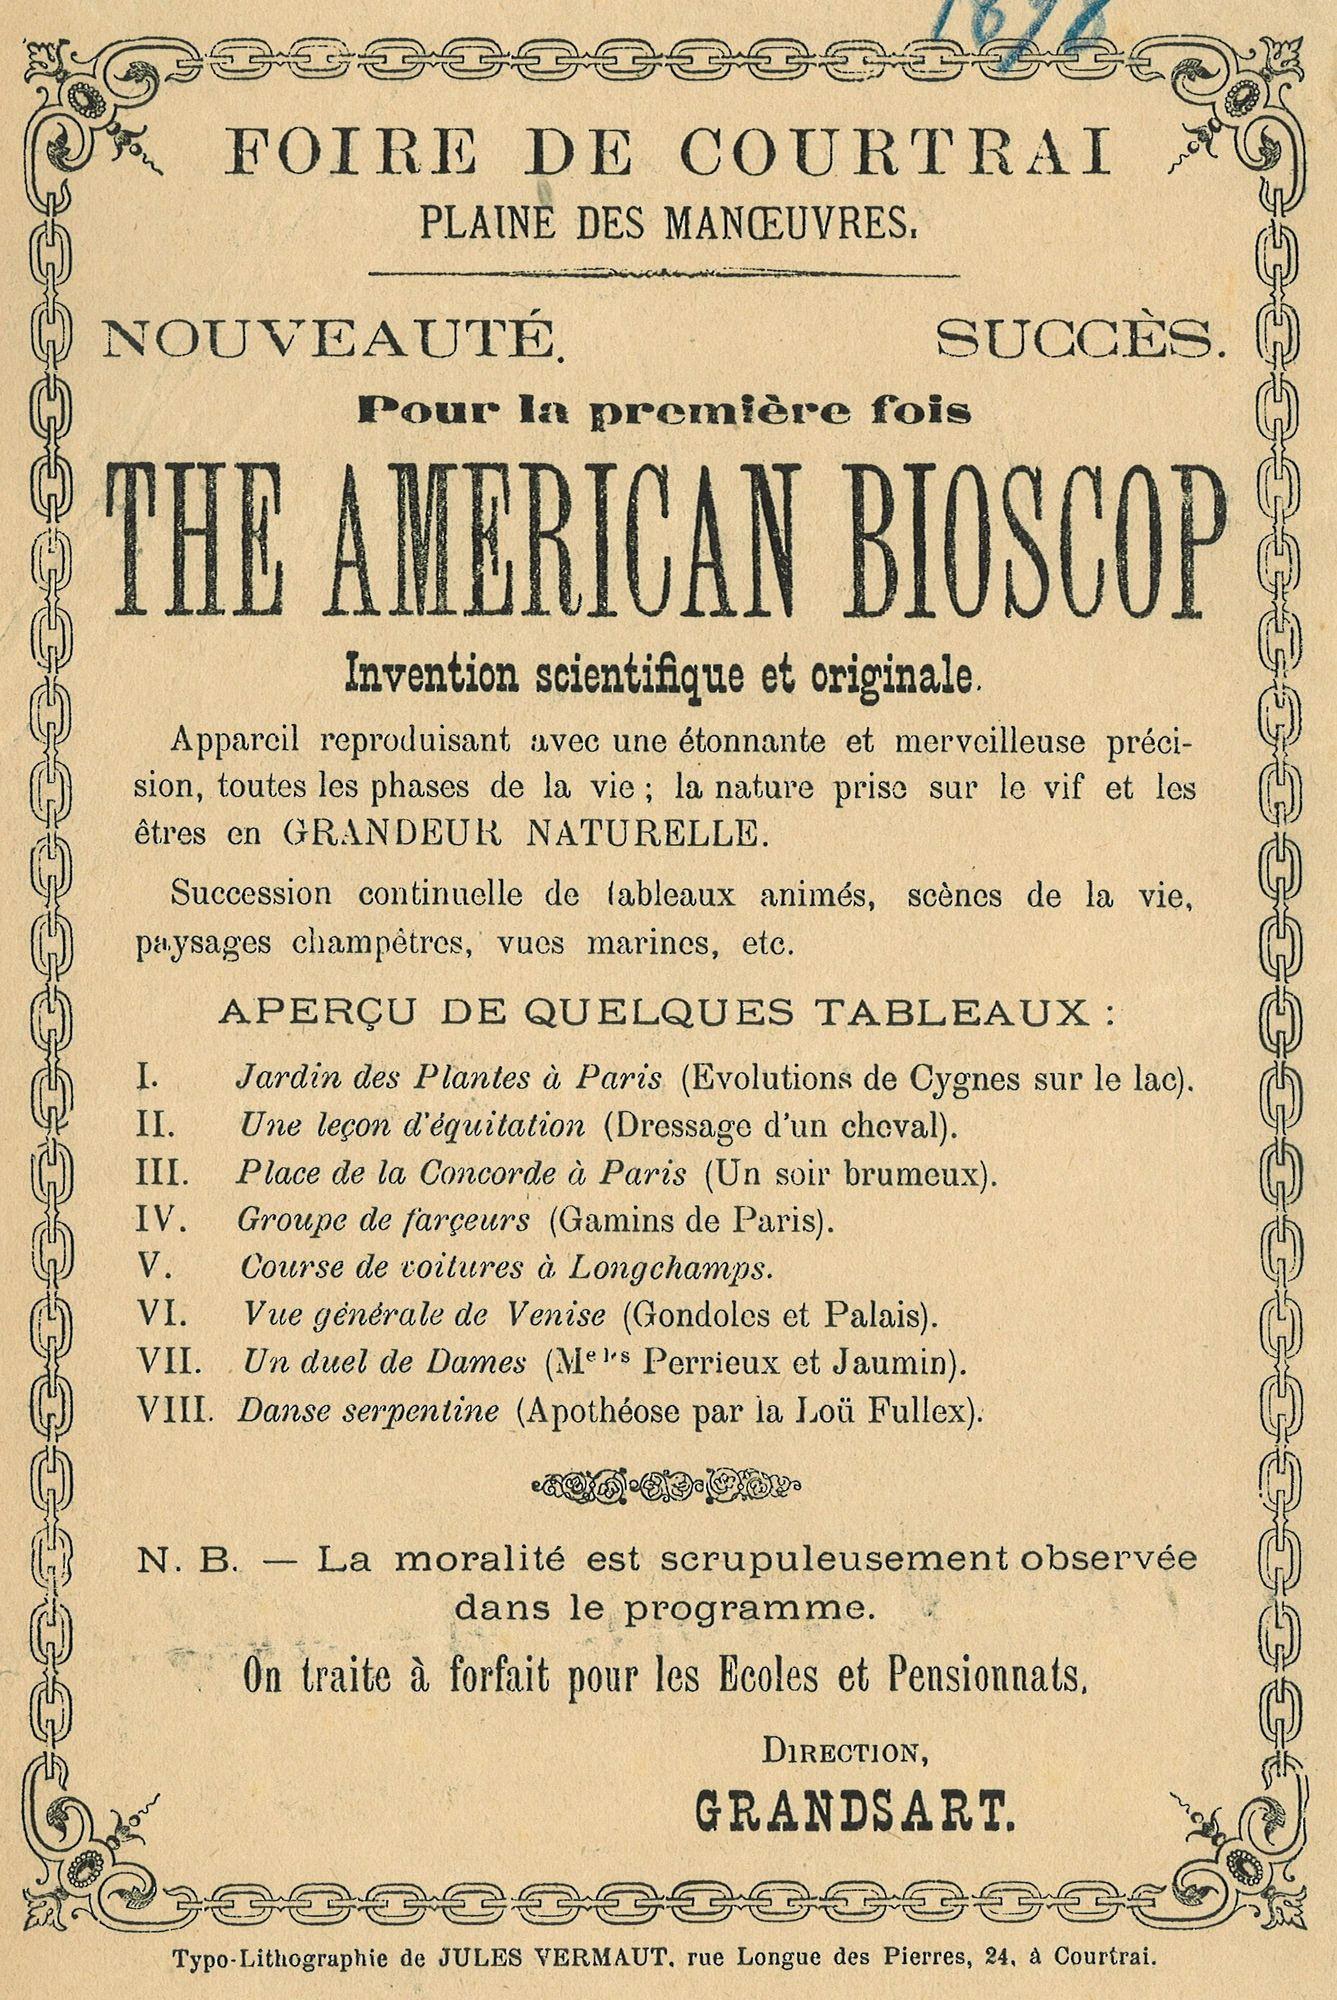 The american bioscop in 1898